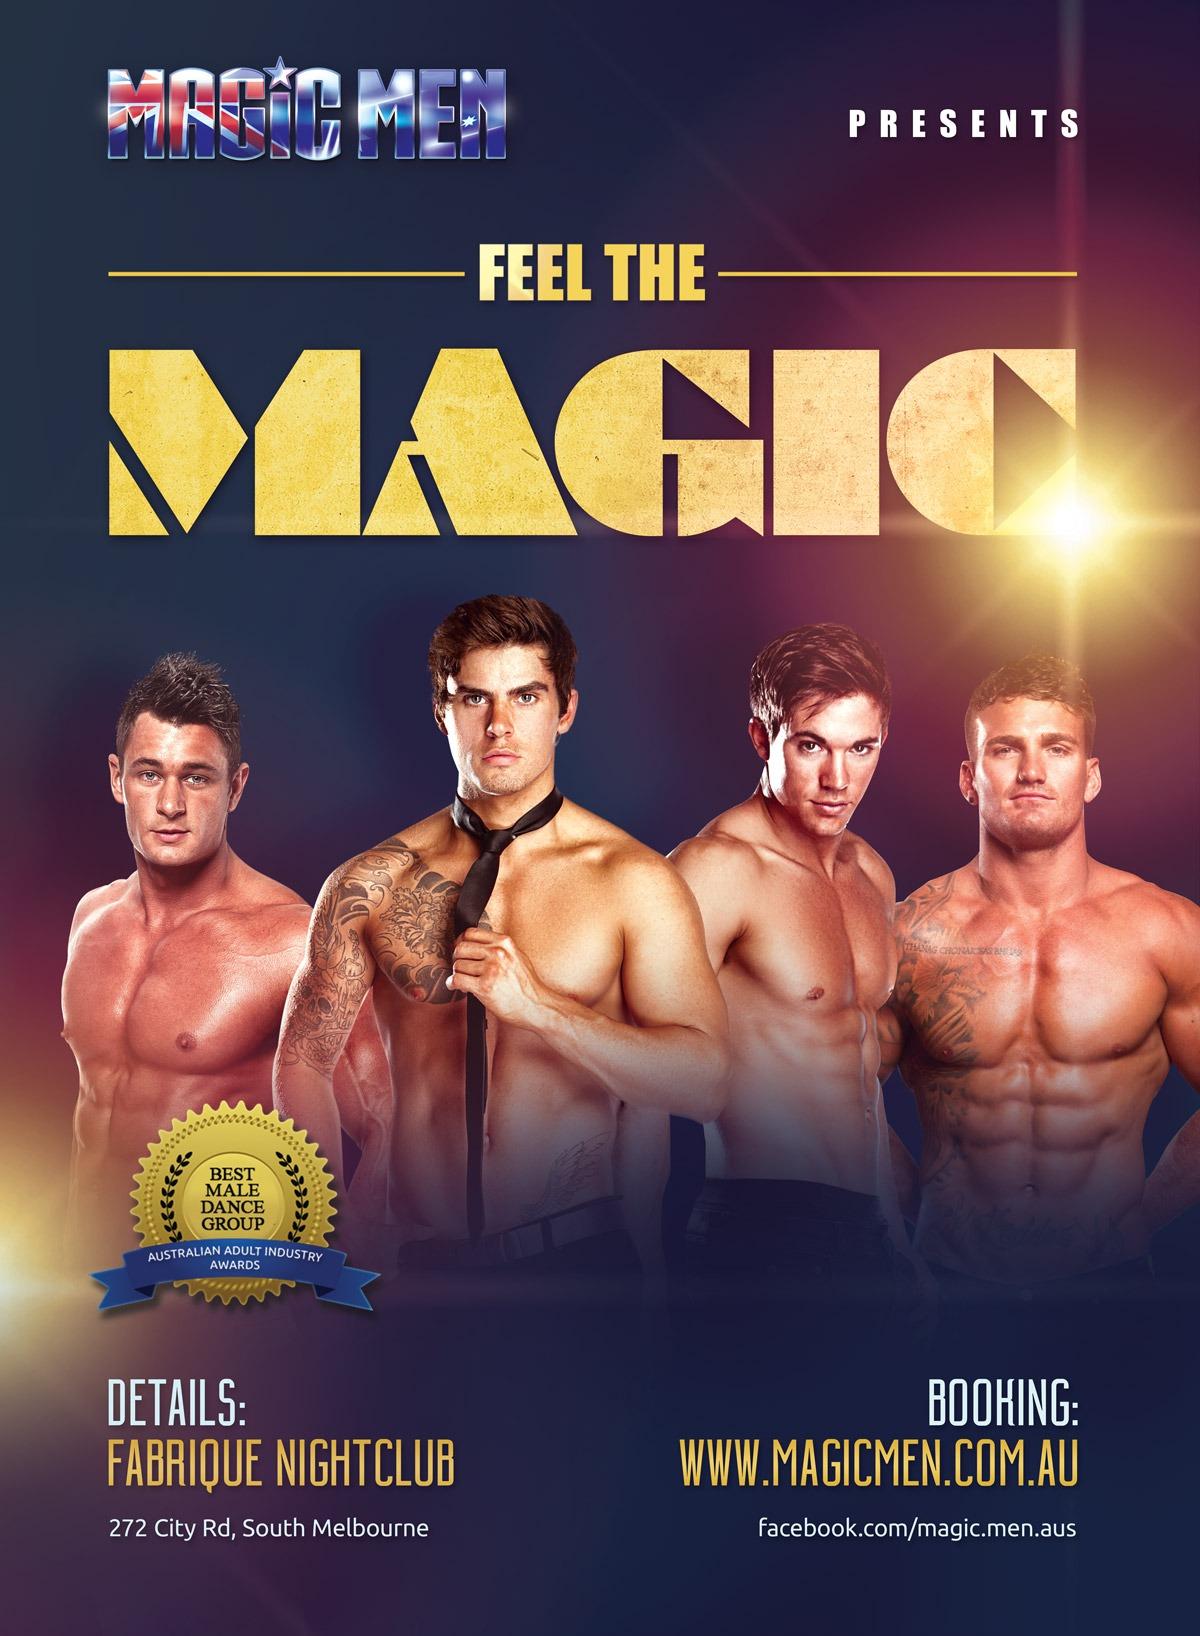 Magicmen show